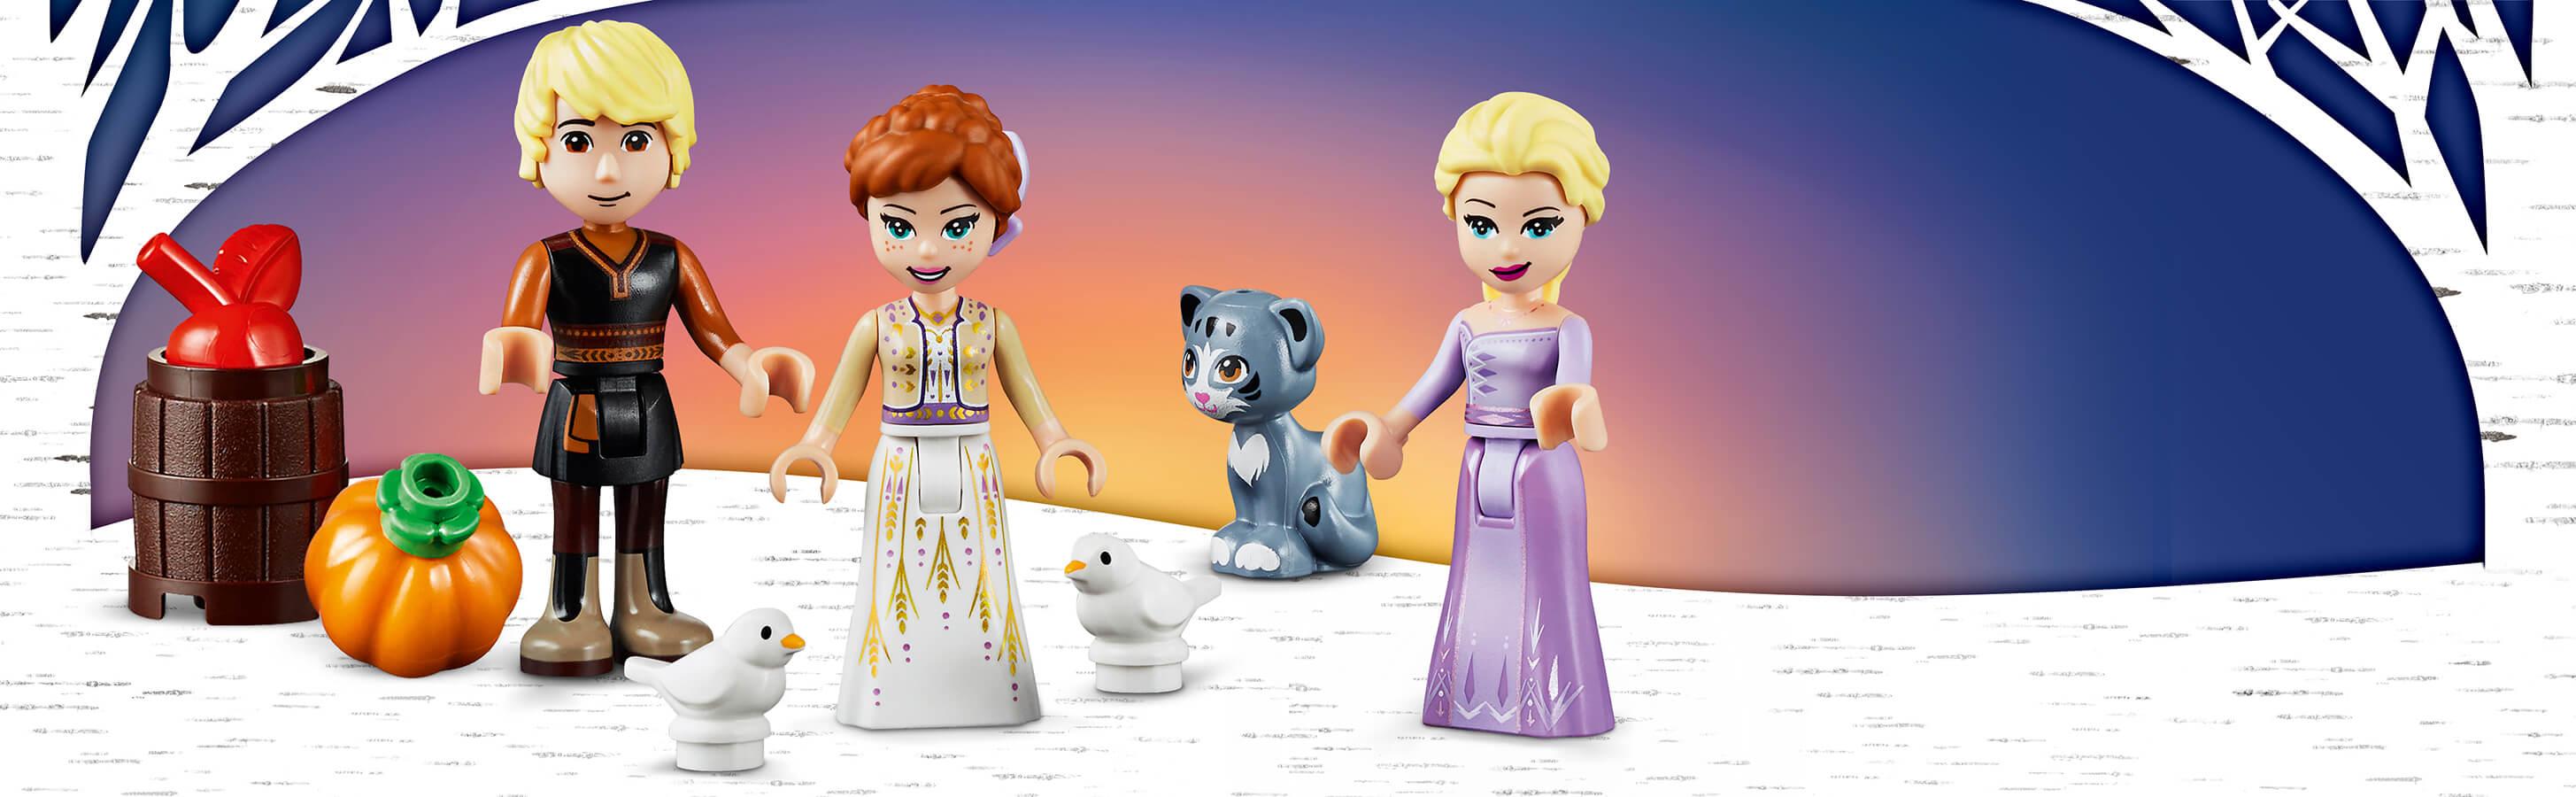 Součástí je Elsa a Anna